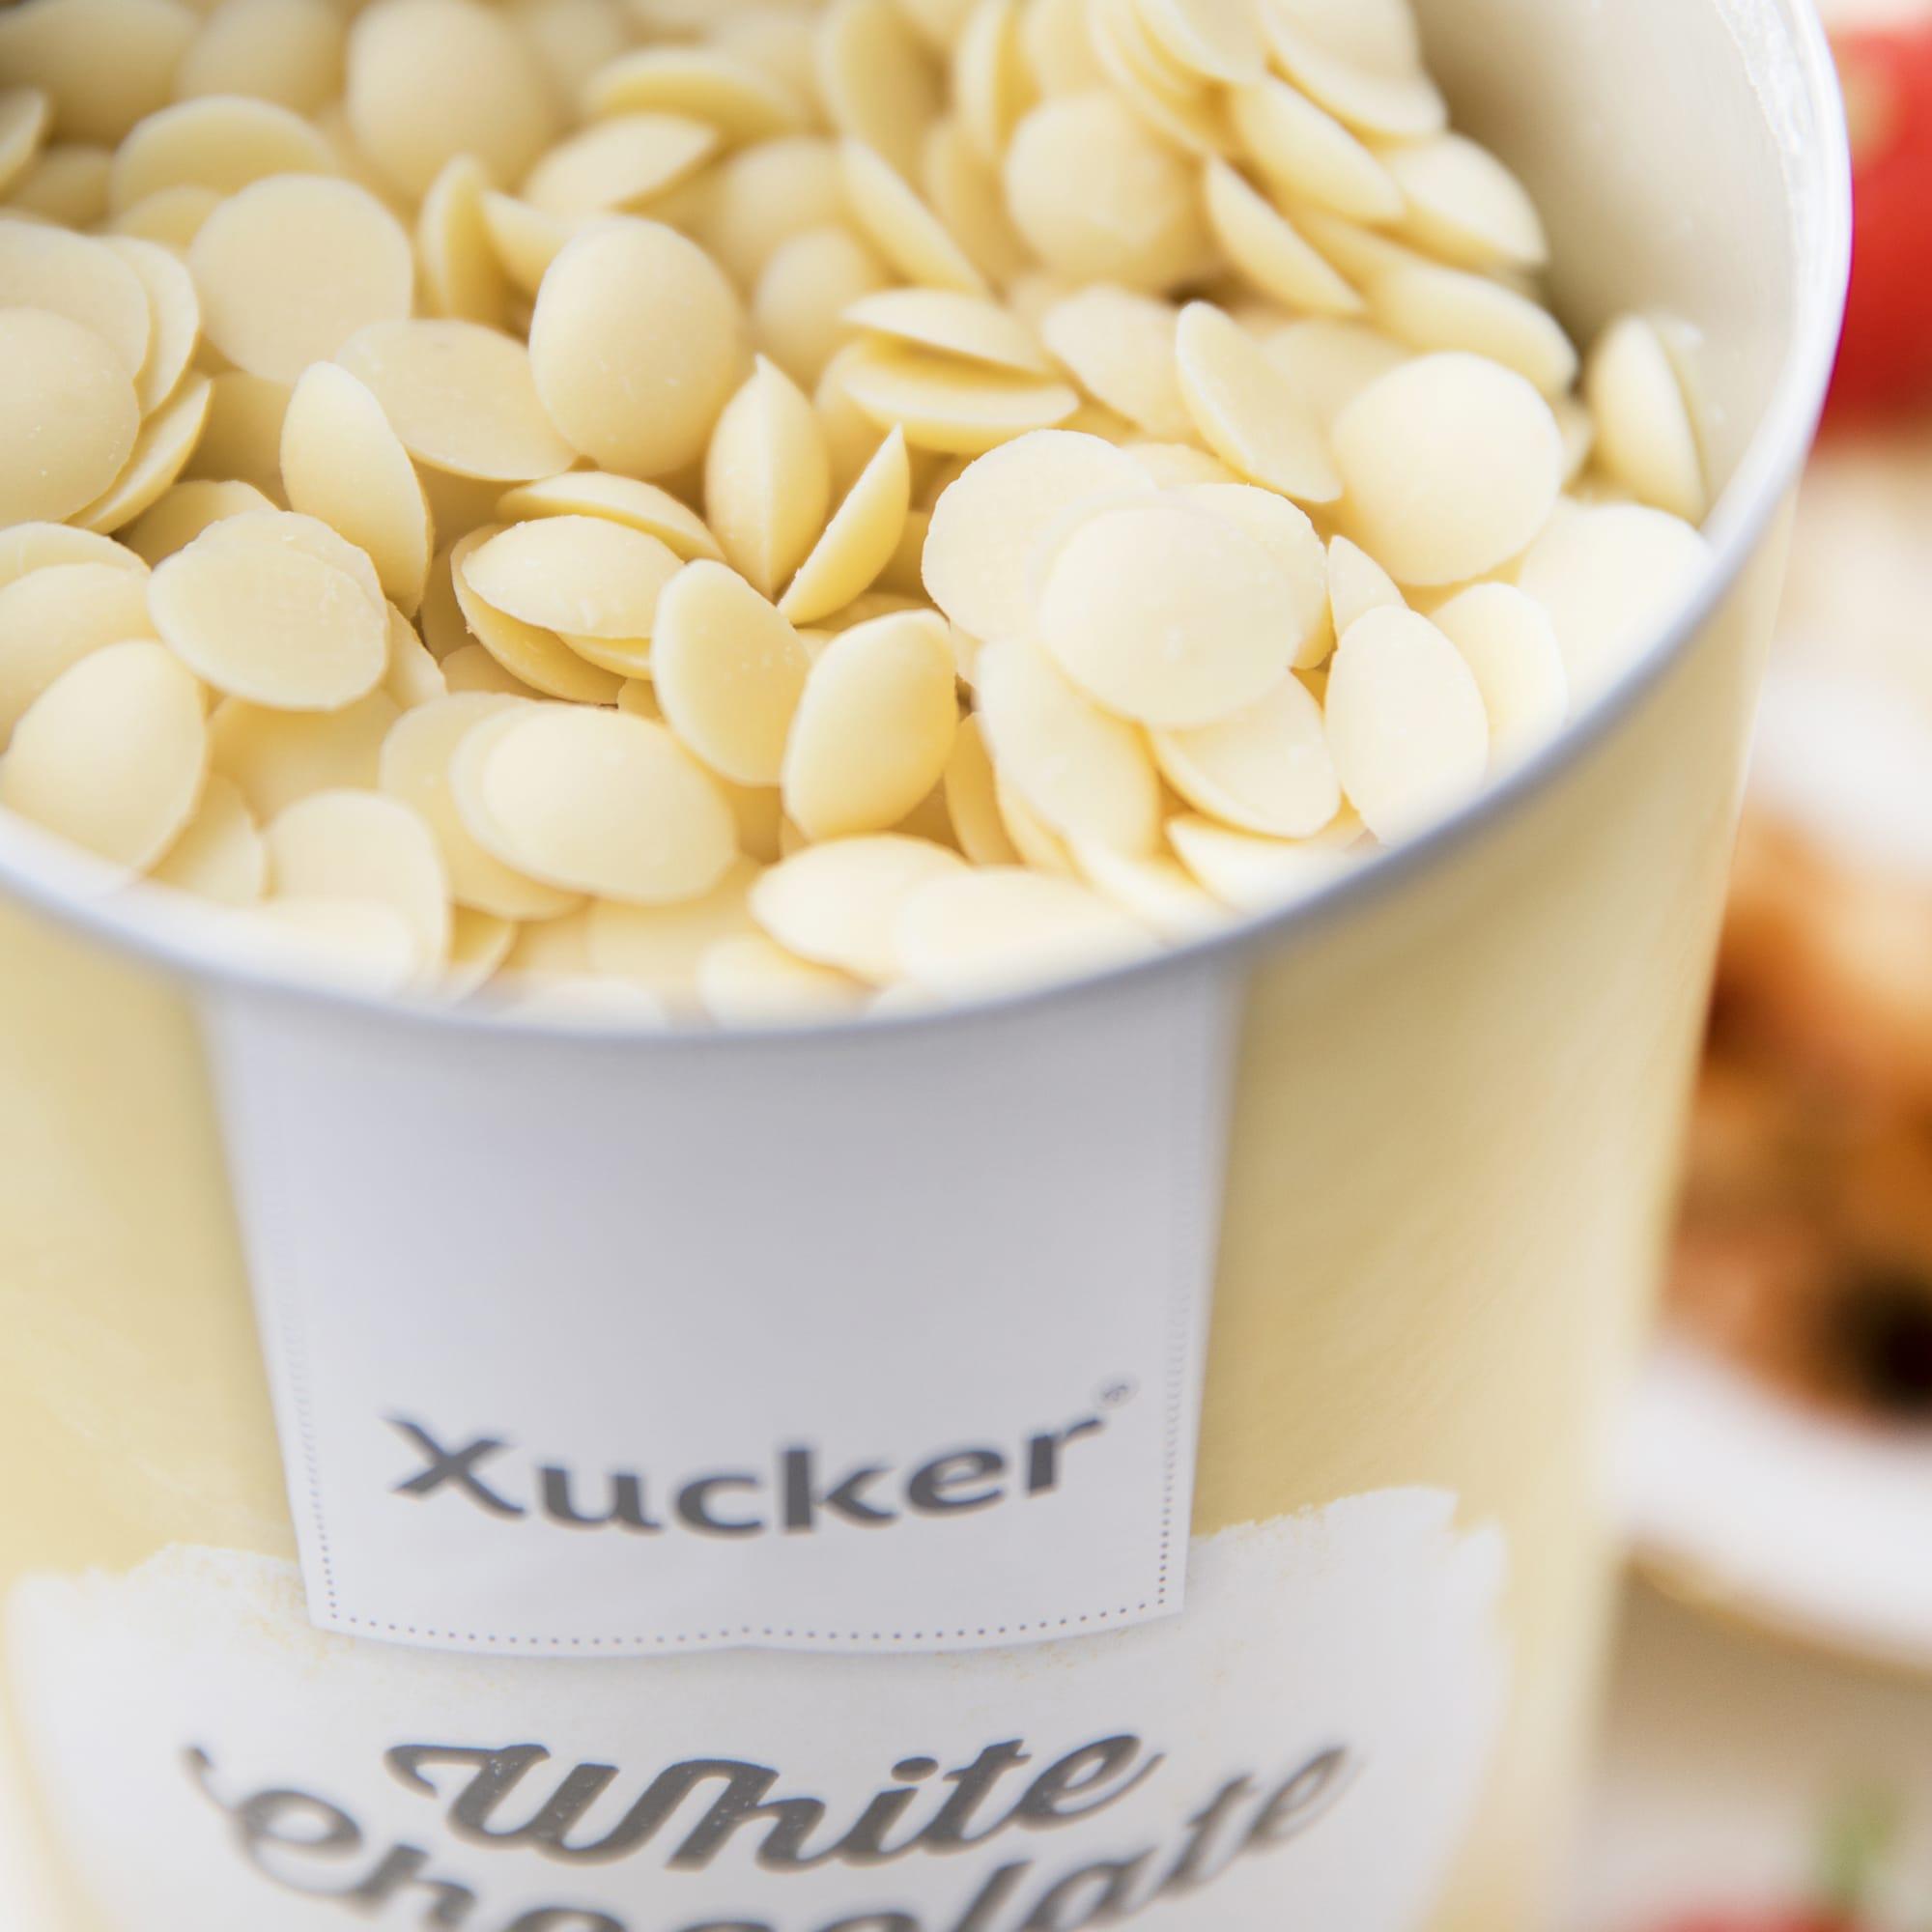 200-g-White-Xucker-Chocolate-Drops-10135_10ZzgoxYkVmNQcZ